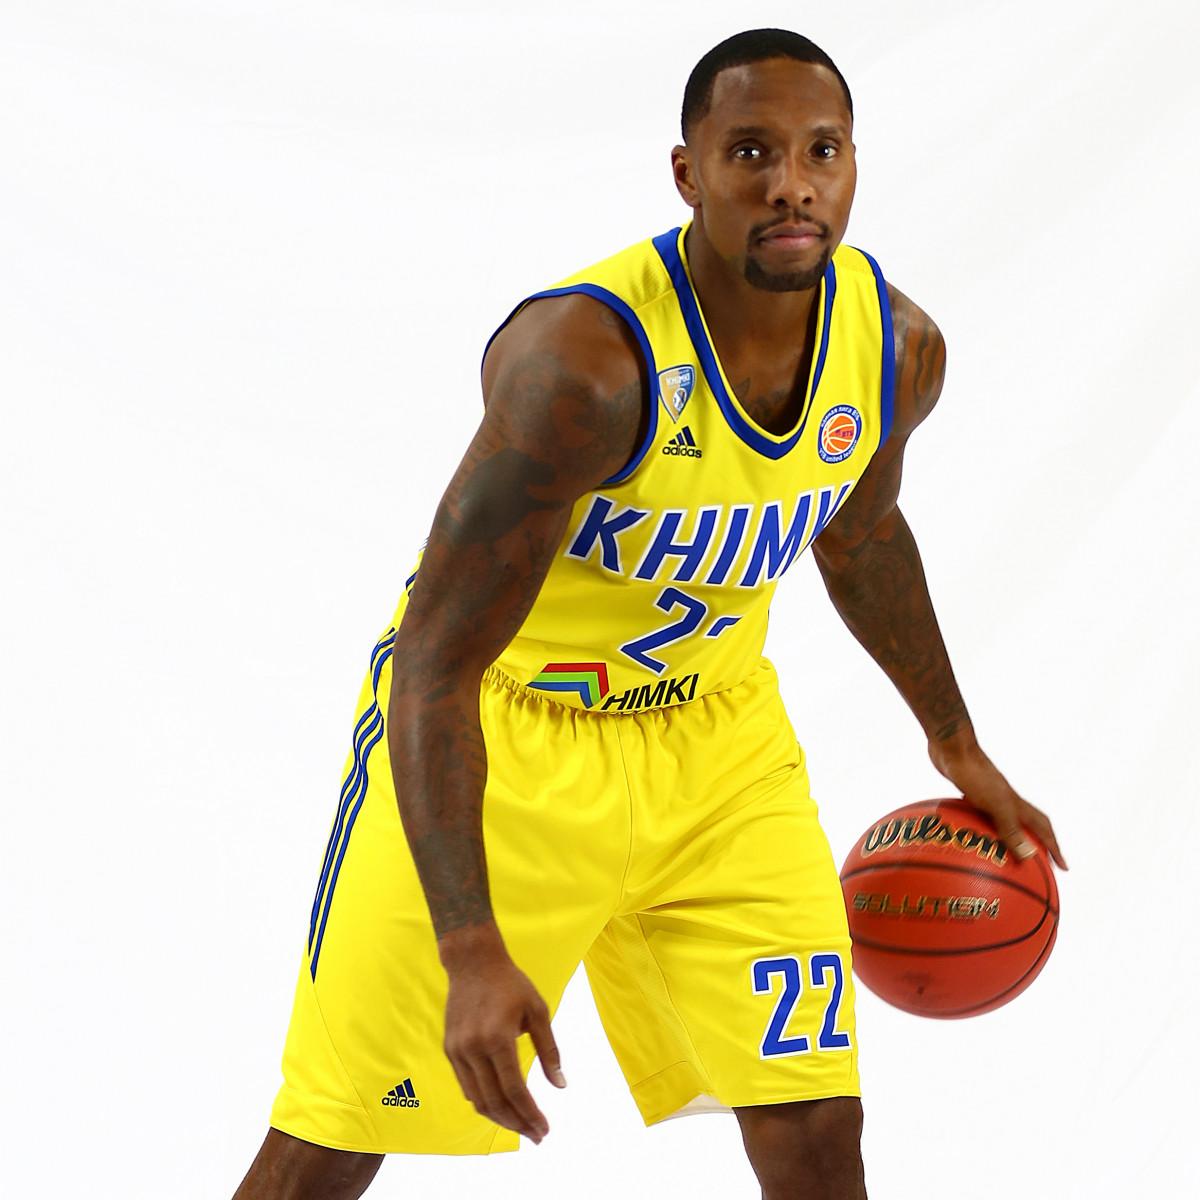 Photo of Earl Rowland, 2016-2017 season